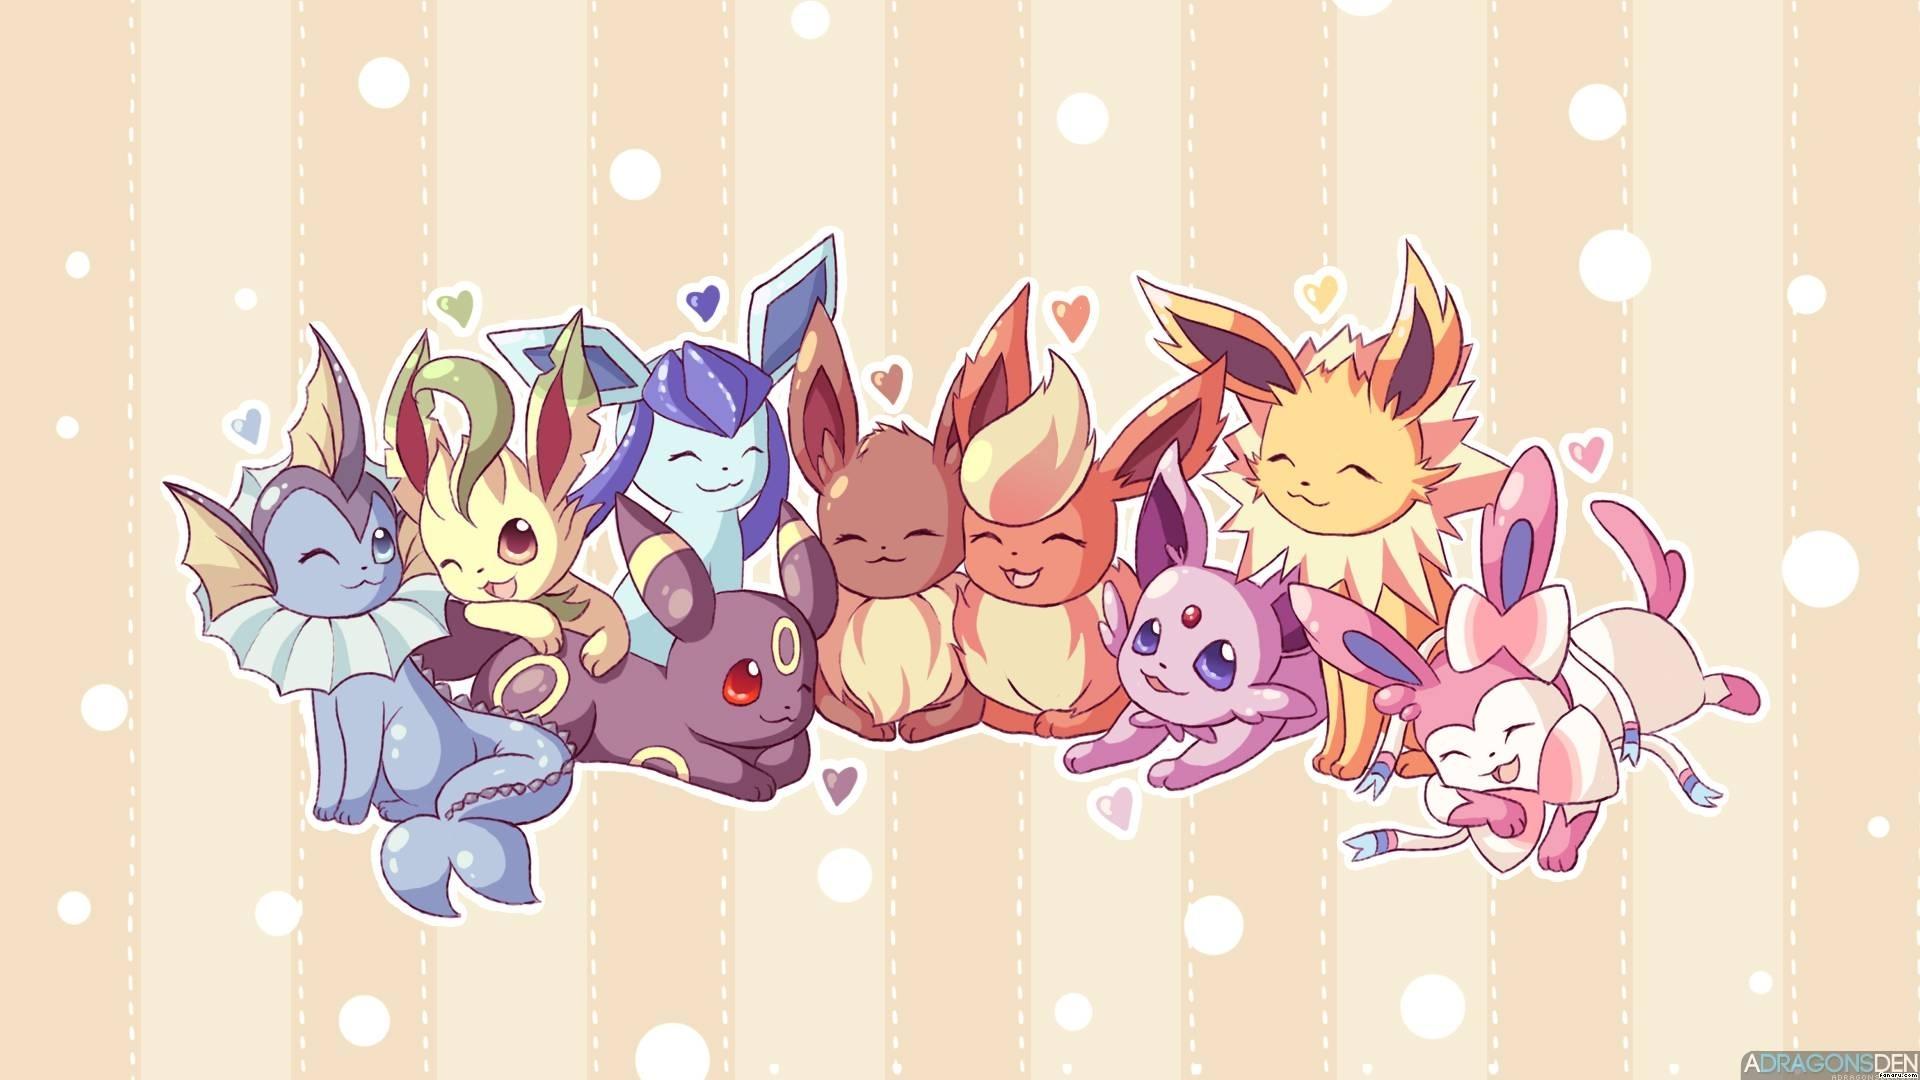 cutest pokemon images cute pokemon wallpaper hd wallpaper and